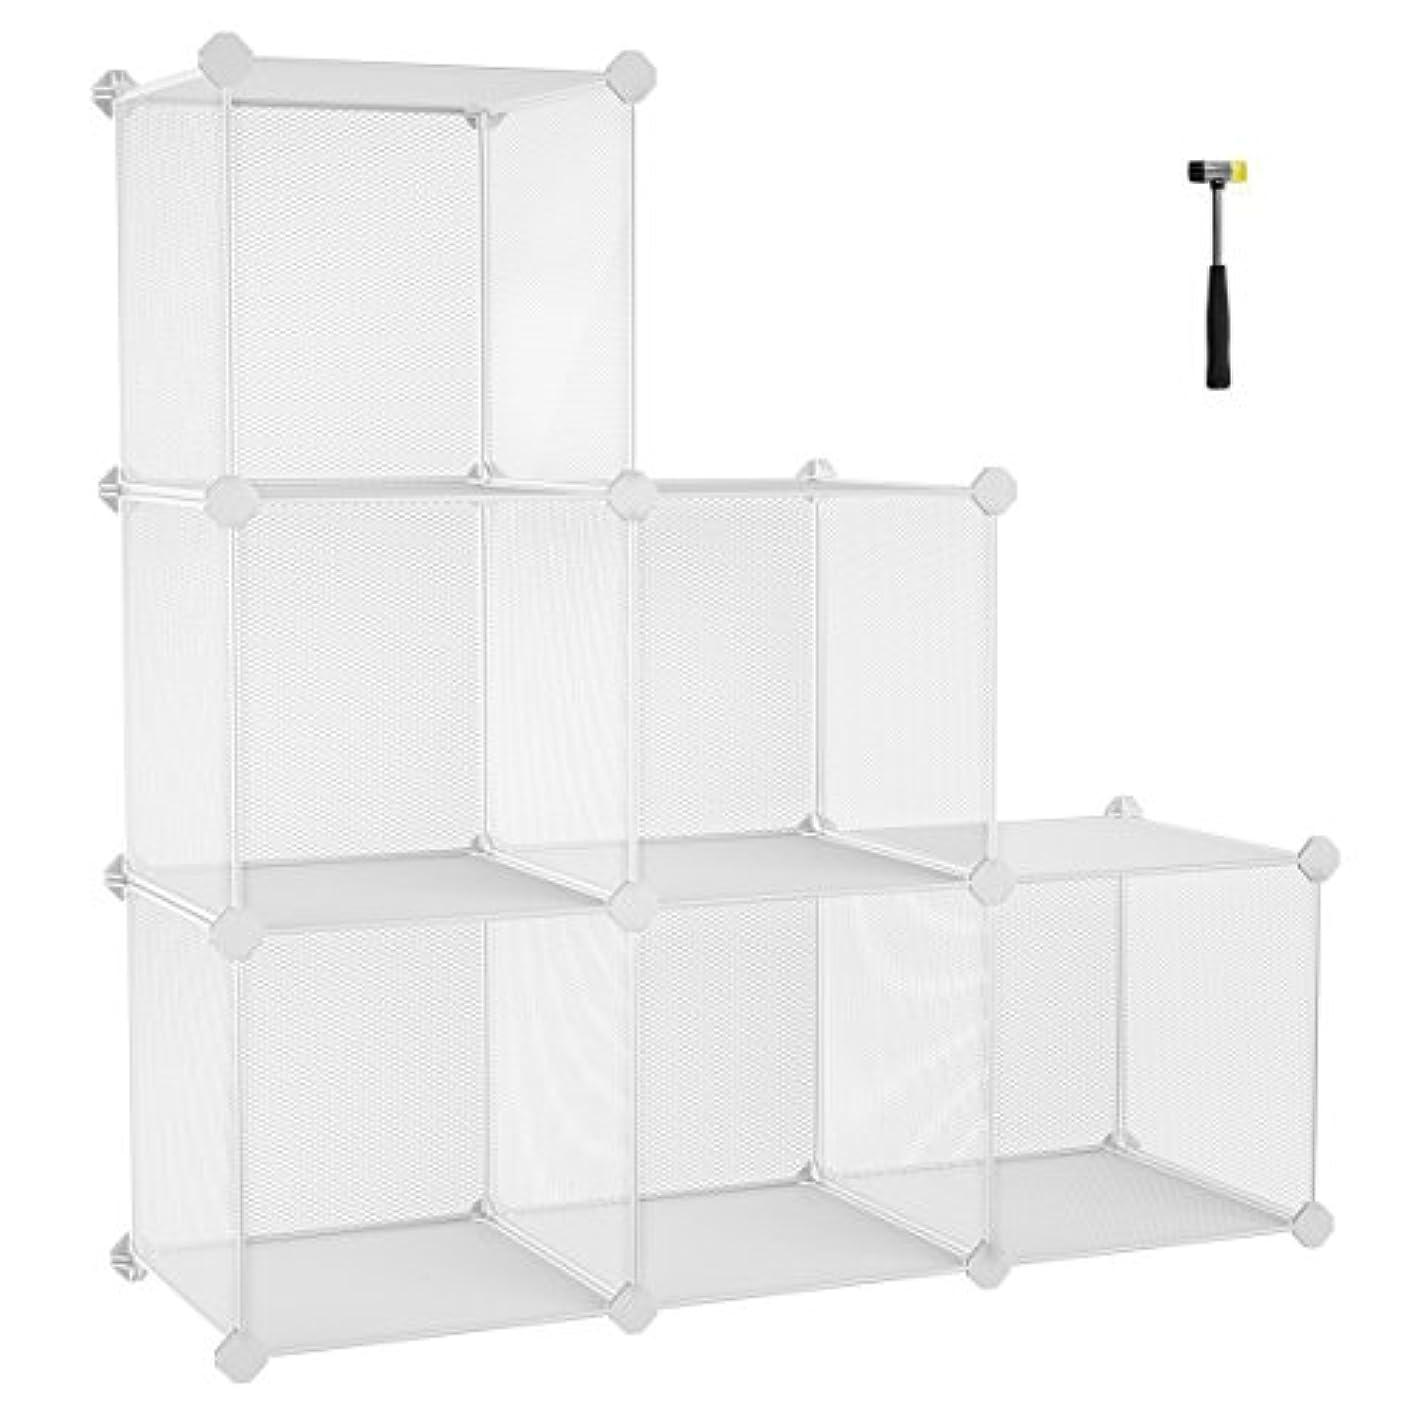 "SONGMICS 6-Cube Metal Mesh Storage Cube, Storage Shelves Organizer, Modular Bookcase, DIY Closet Cabinet Shelf for Books, Plant, Toys, Shoes, Clothes, 36.6""L x 12.2""W x 36.6""H, White ULPL111W"